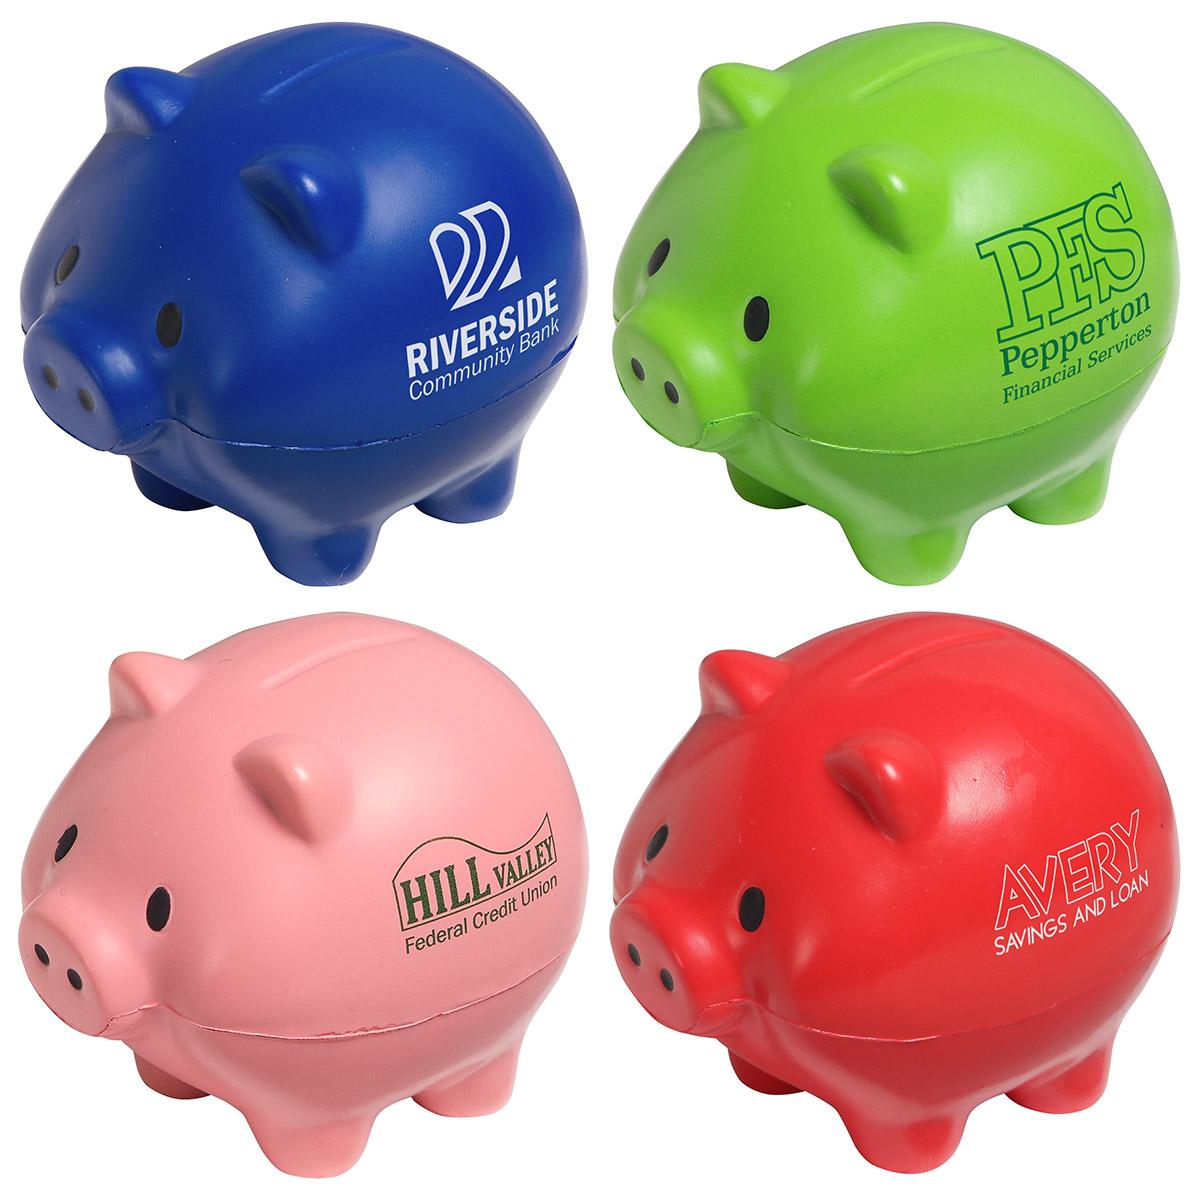 Thrifty Pig Stress Reliever, LFN-TP20 - 1 Colour Imprint